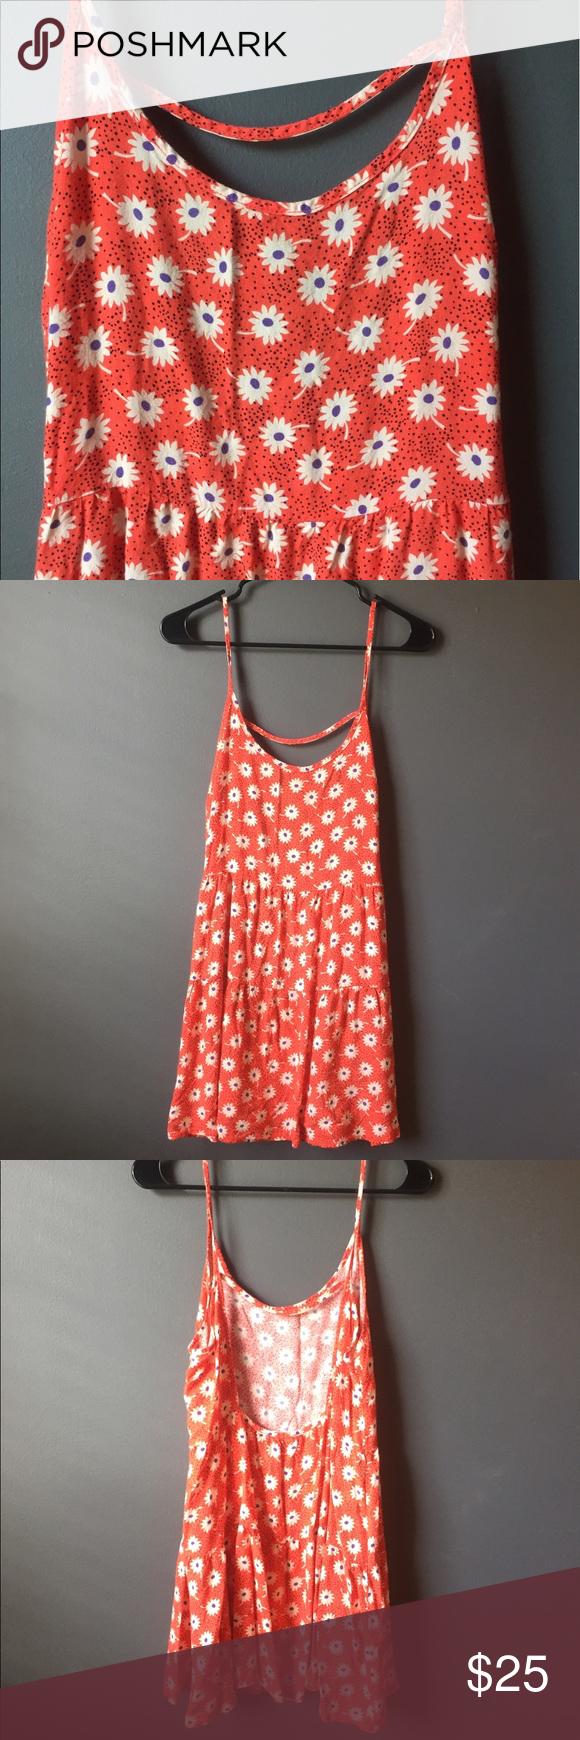 Lush sundress Super cute sundress with flowers🌸 size medium 100% rayon Lush Dresses Mini